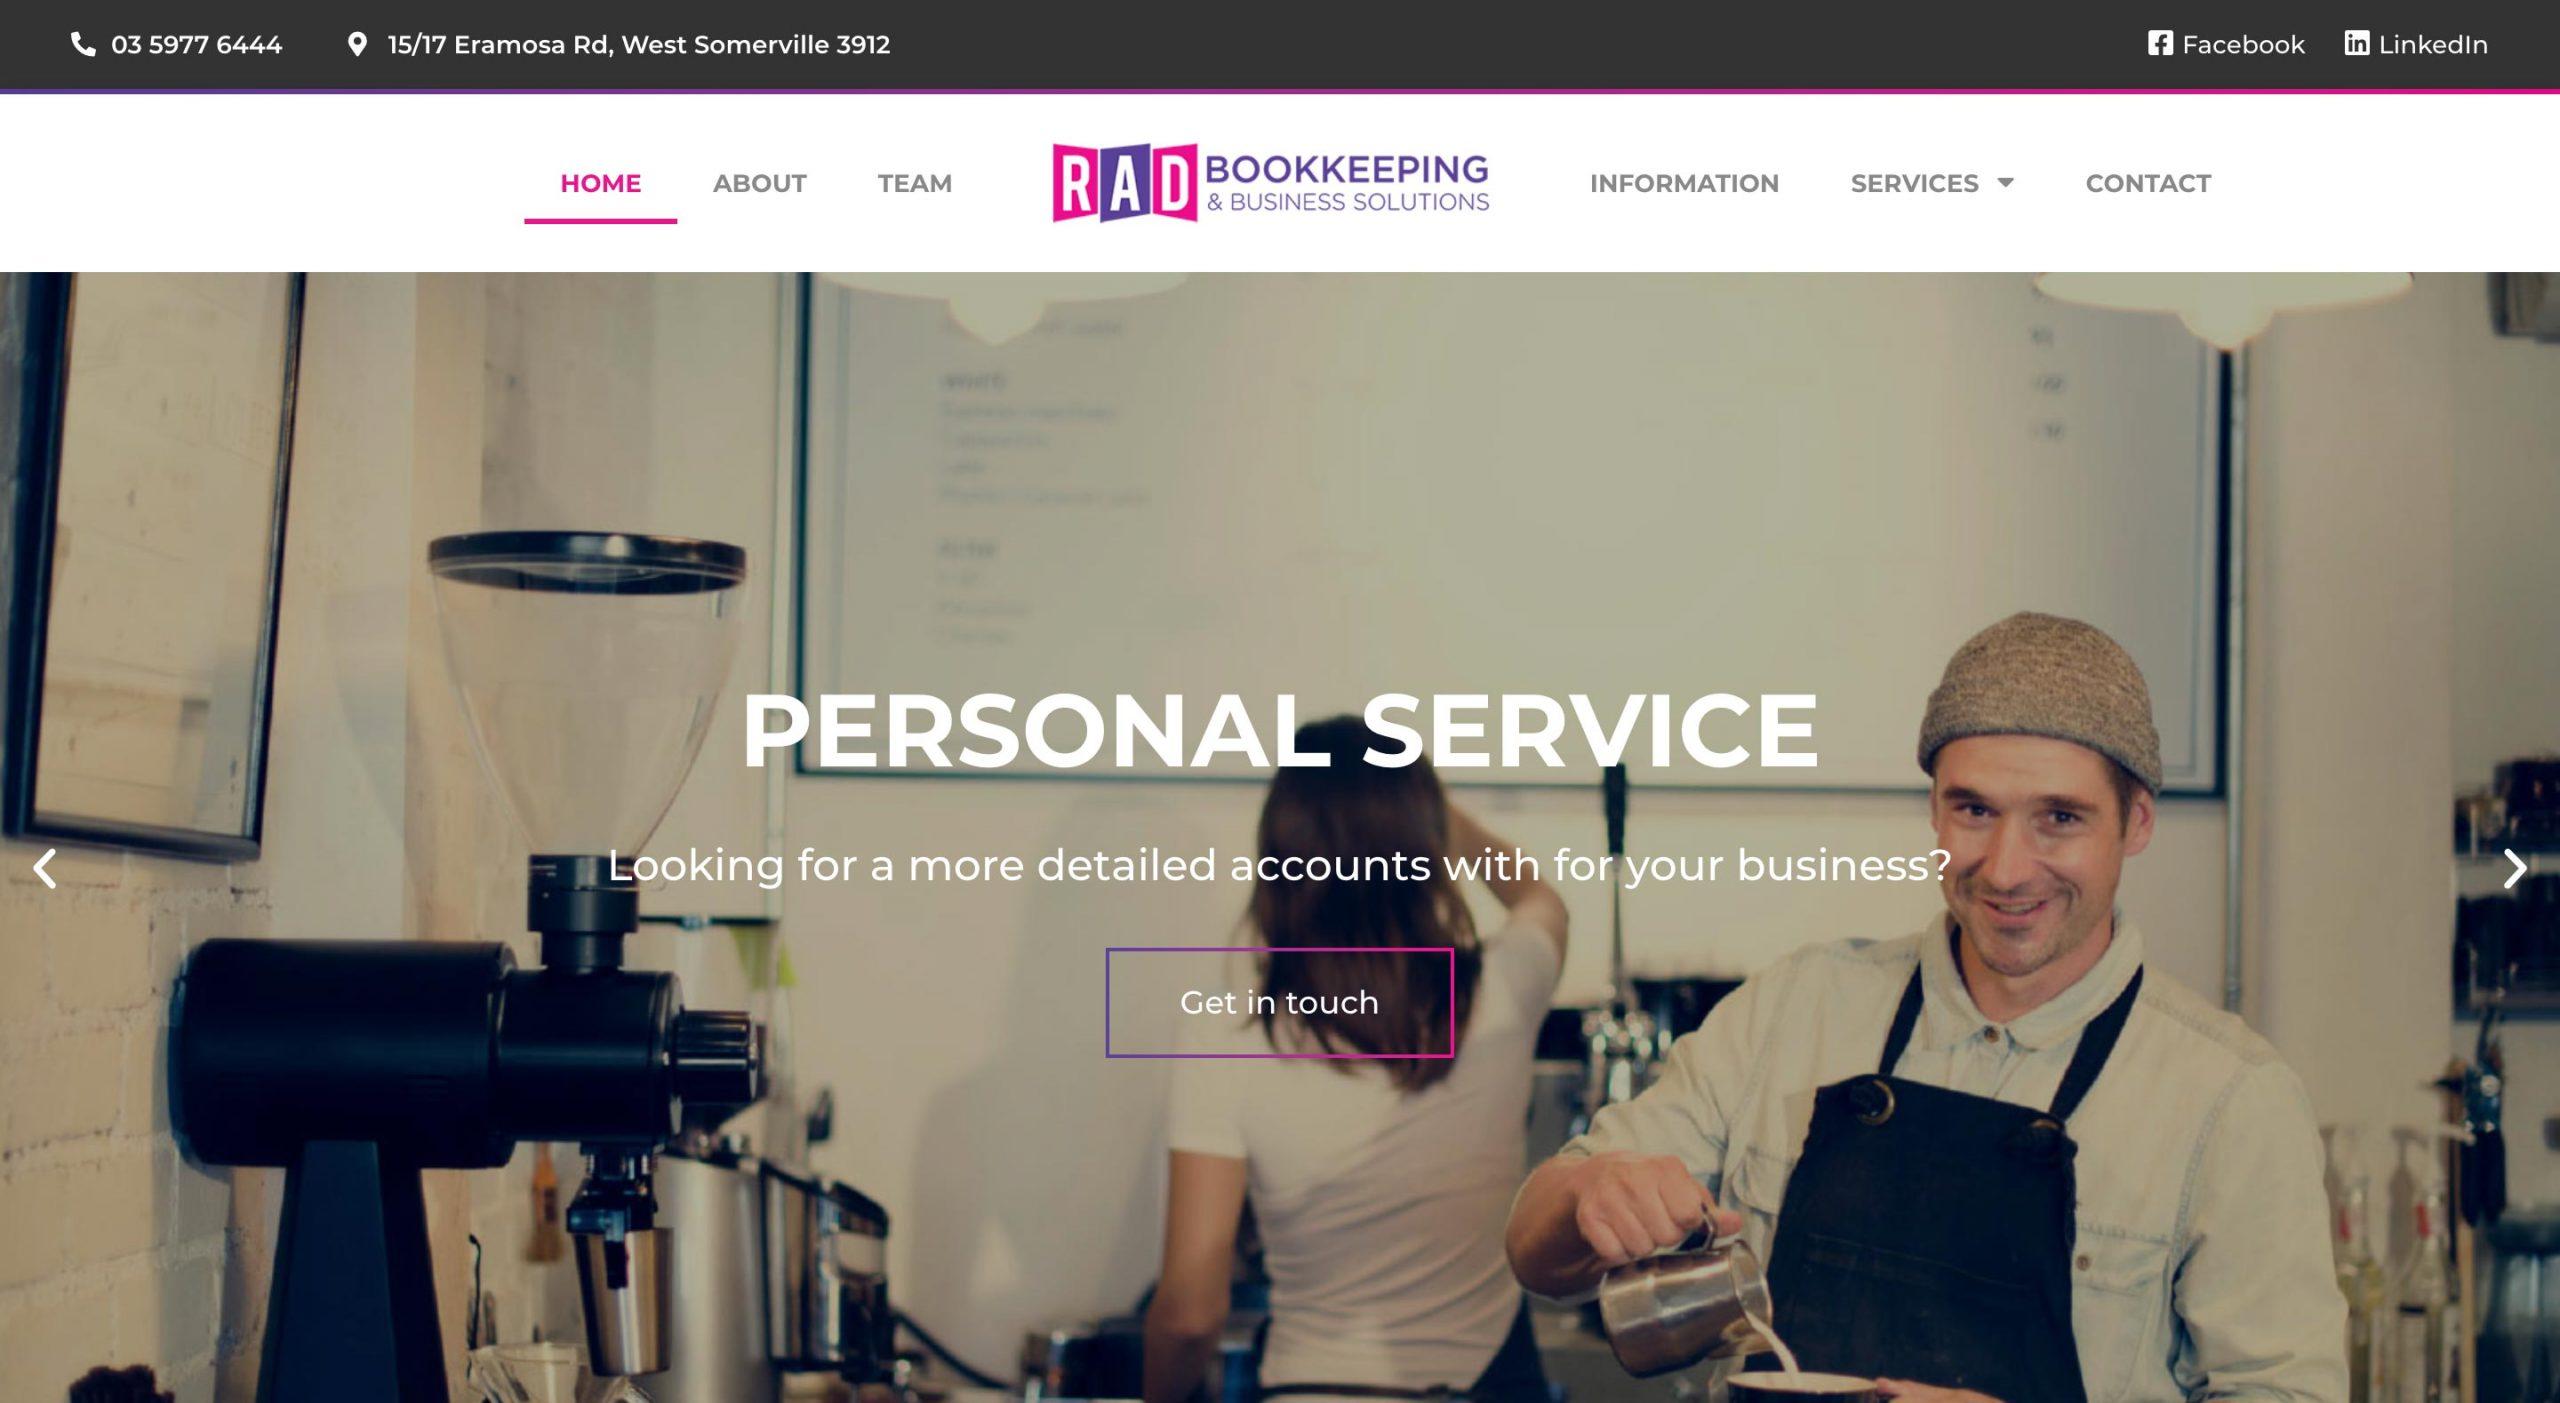 RAD Bookkeeping